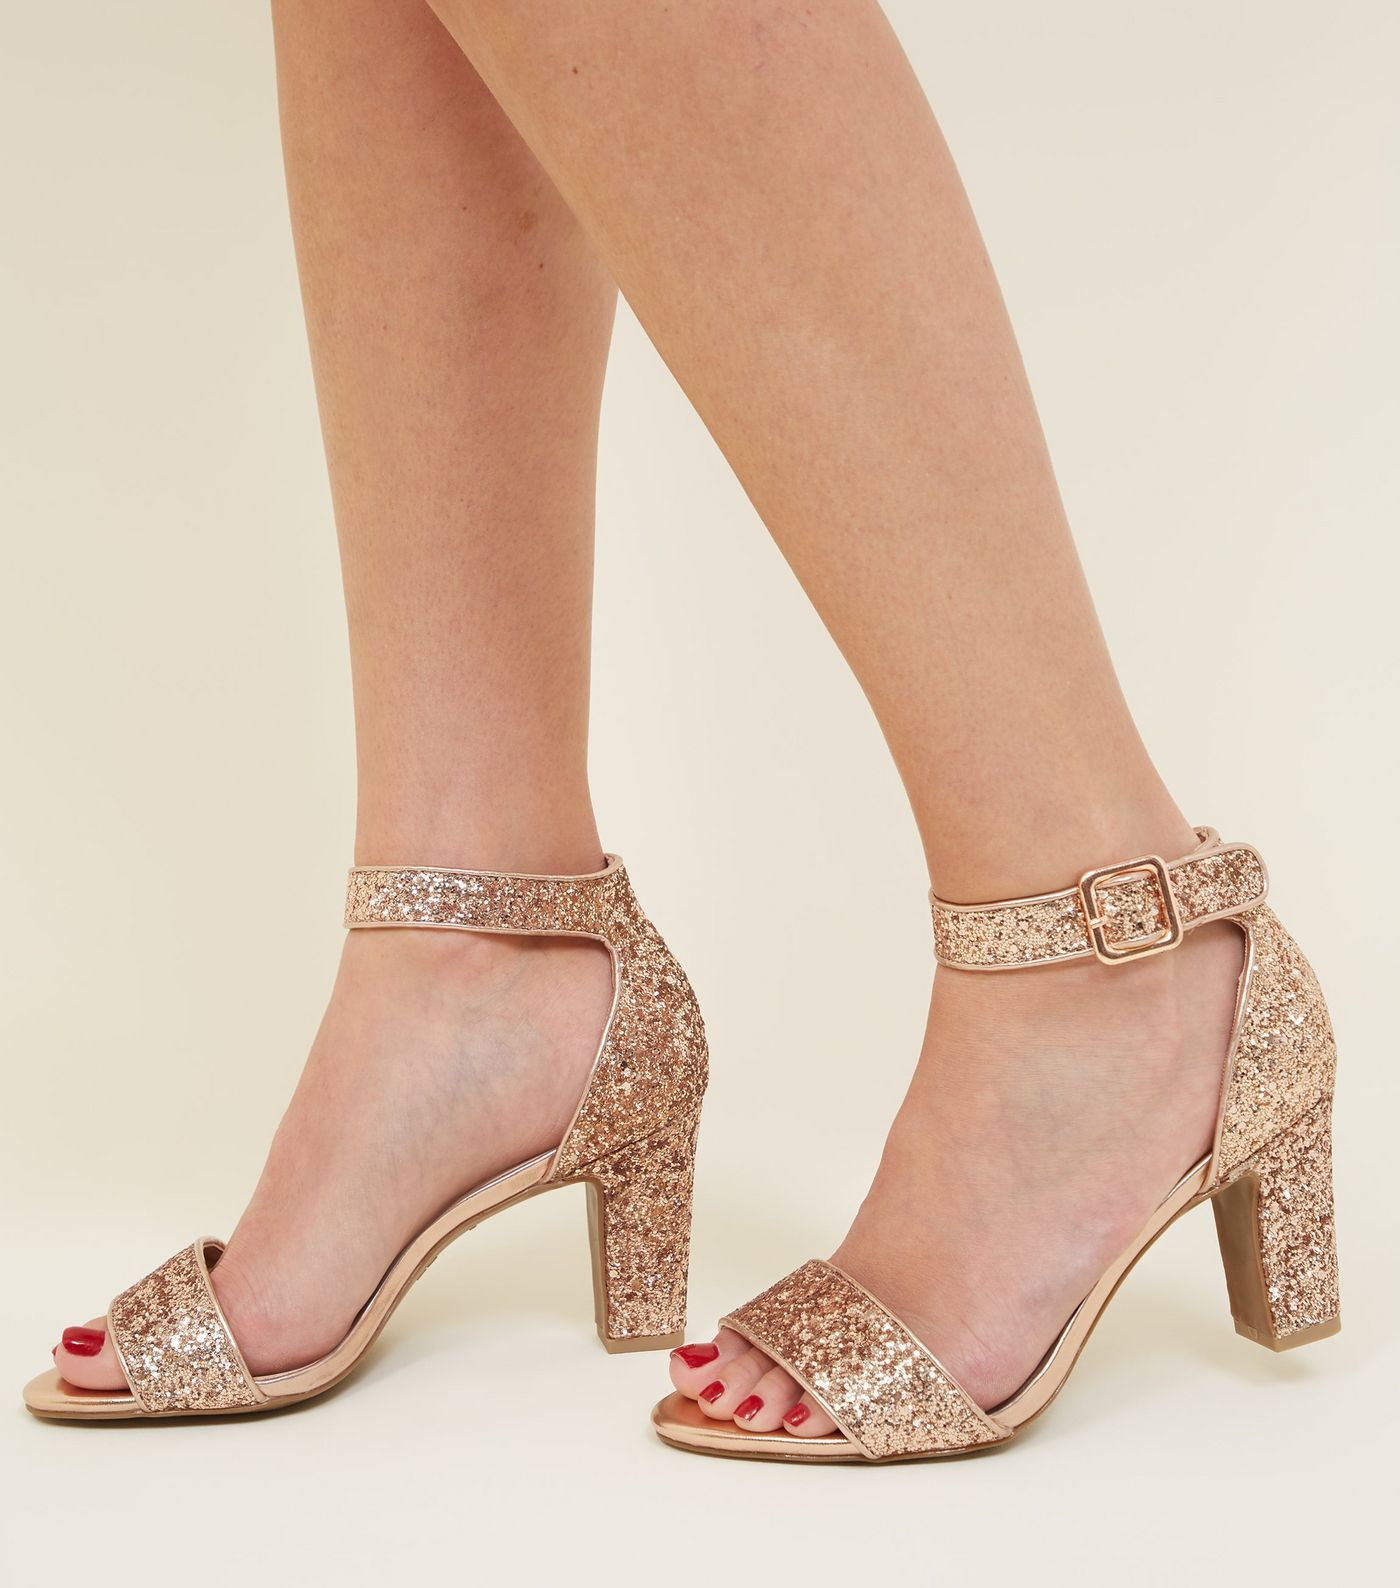 Glittery Silver Heels Block Comfort In 2019Footware Flex zSqjLVpUGM